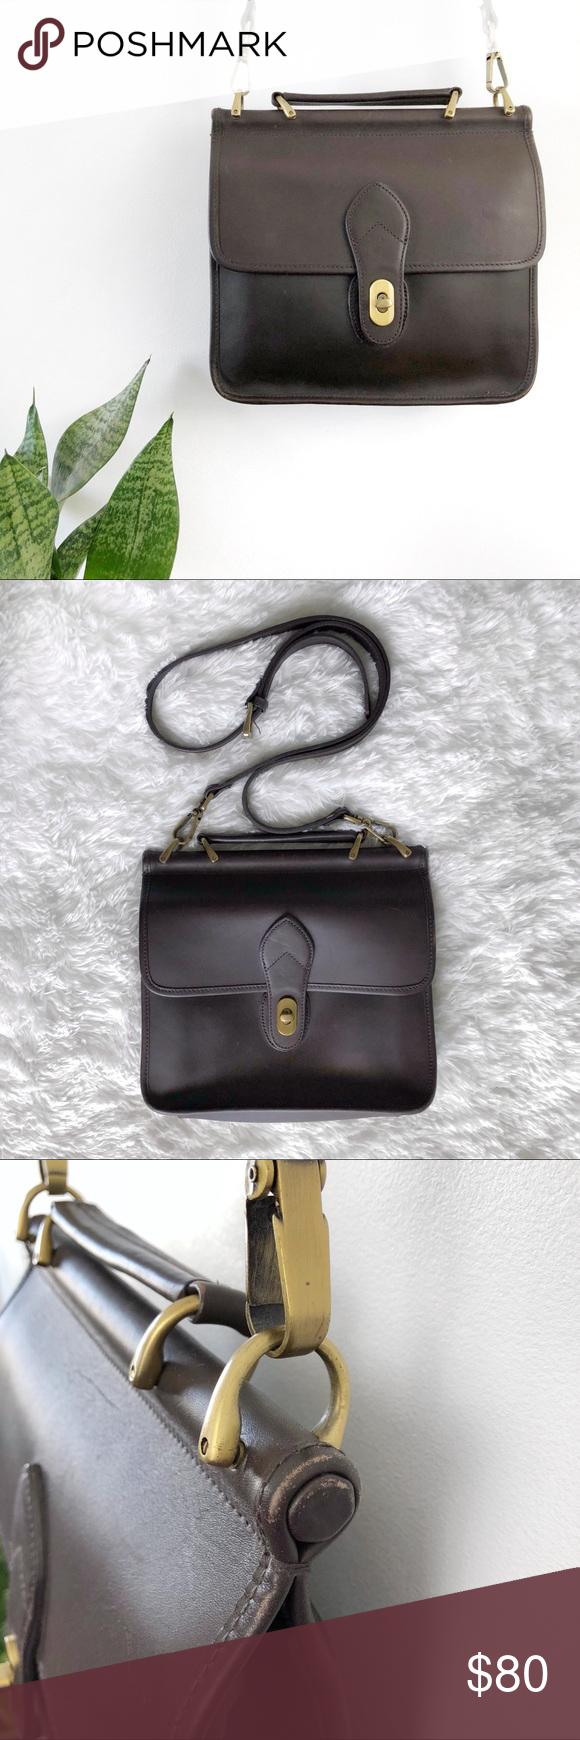 Croft And Barrow Leather Saddle Bag Crossbody My Posh